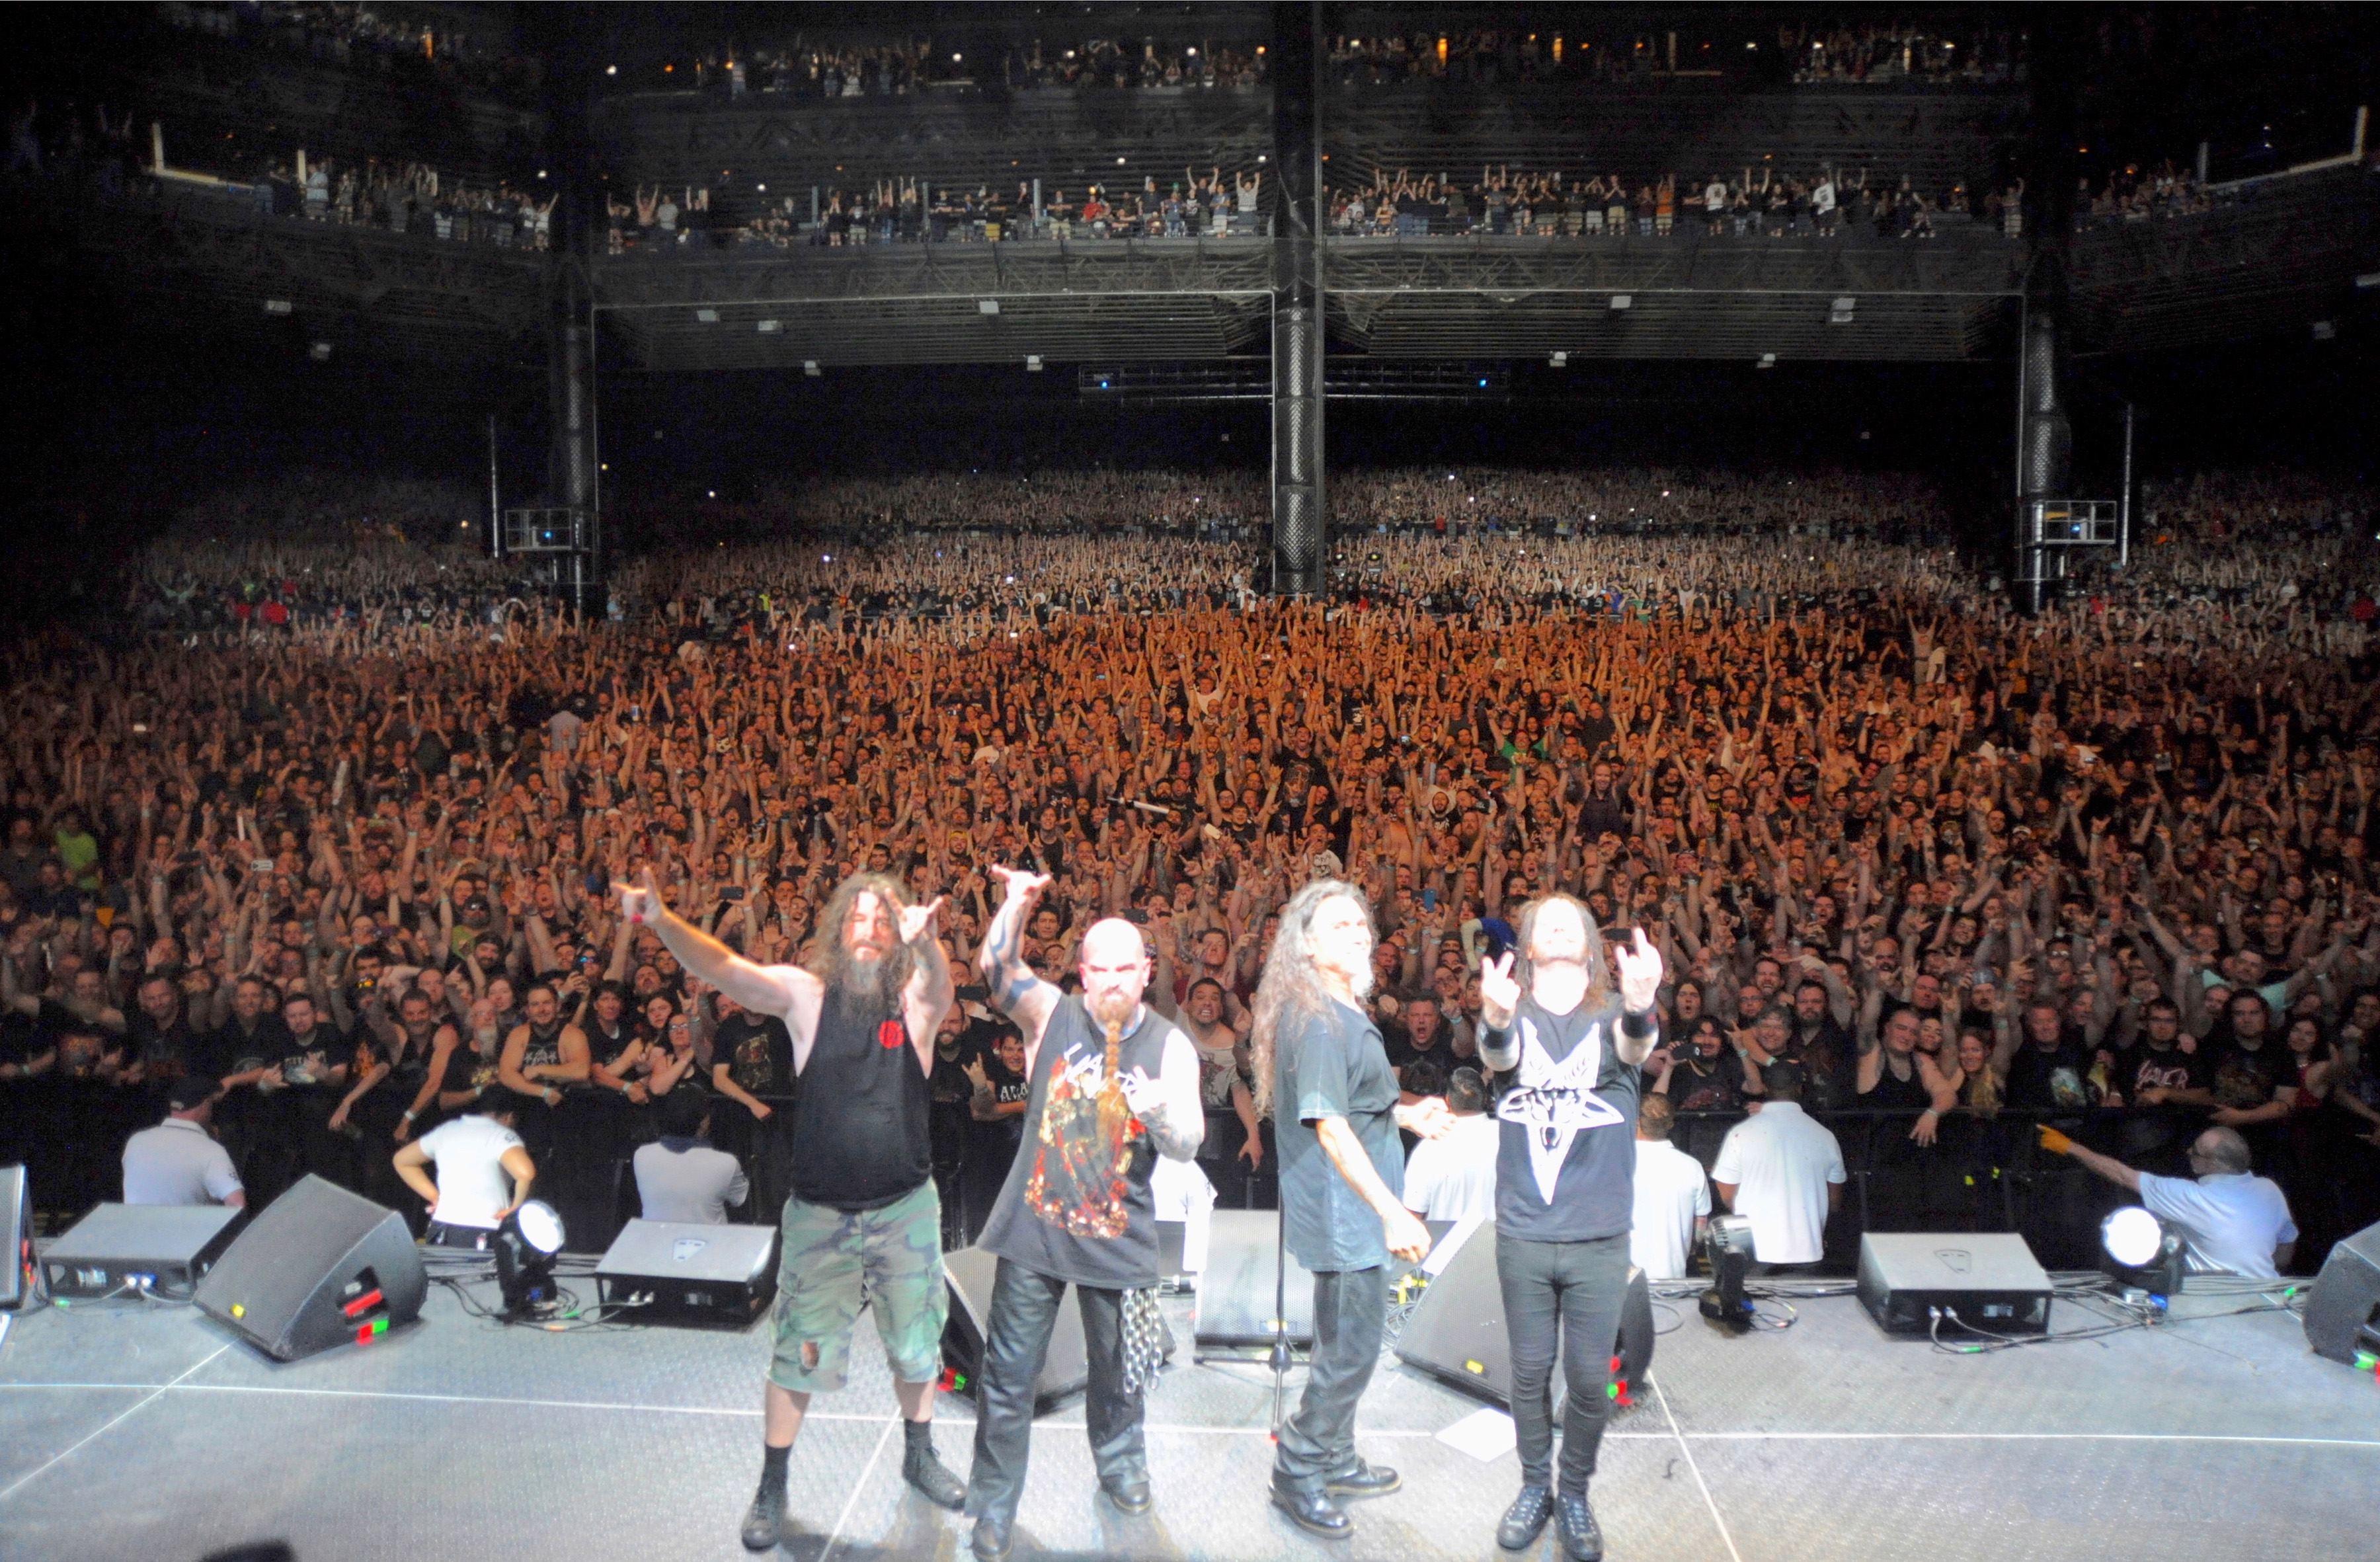 News: Slayer's Final World Tour Will Extend To 2019